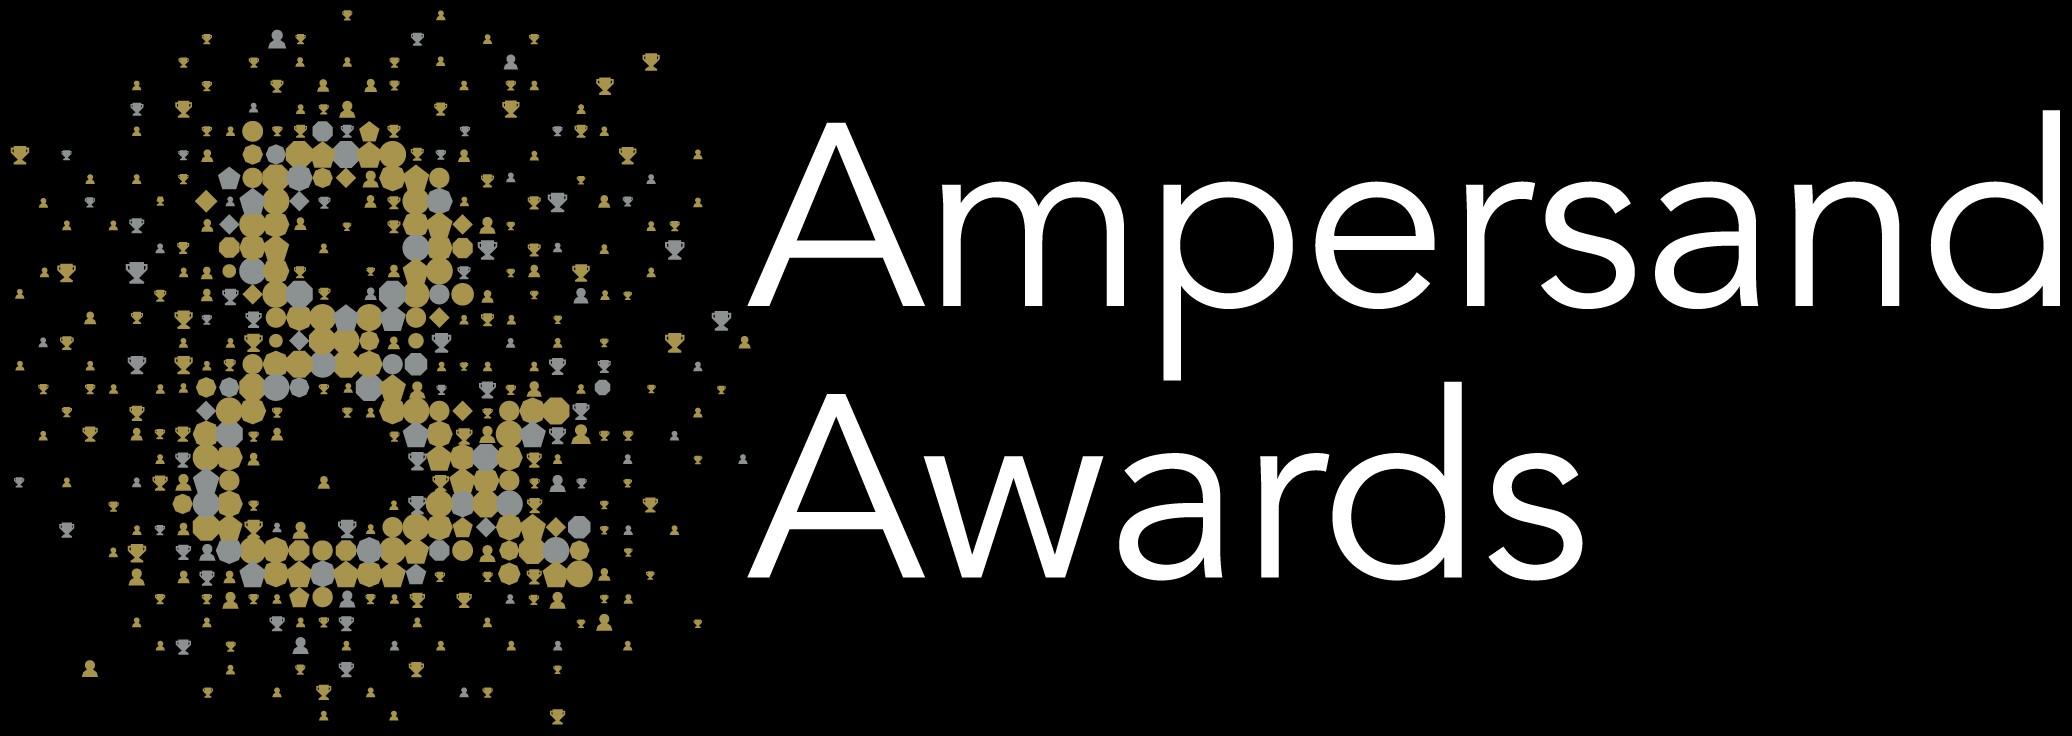 Ampersand Awards logo